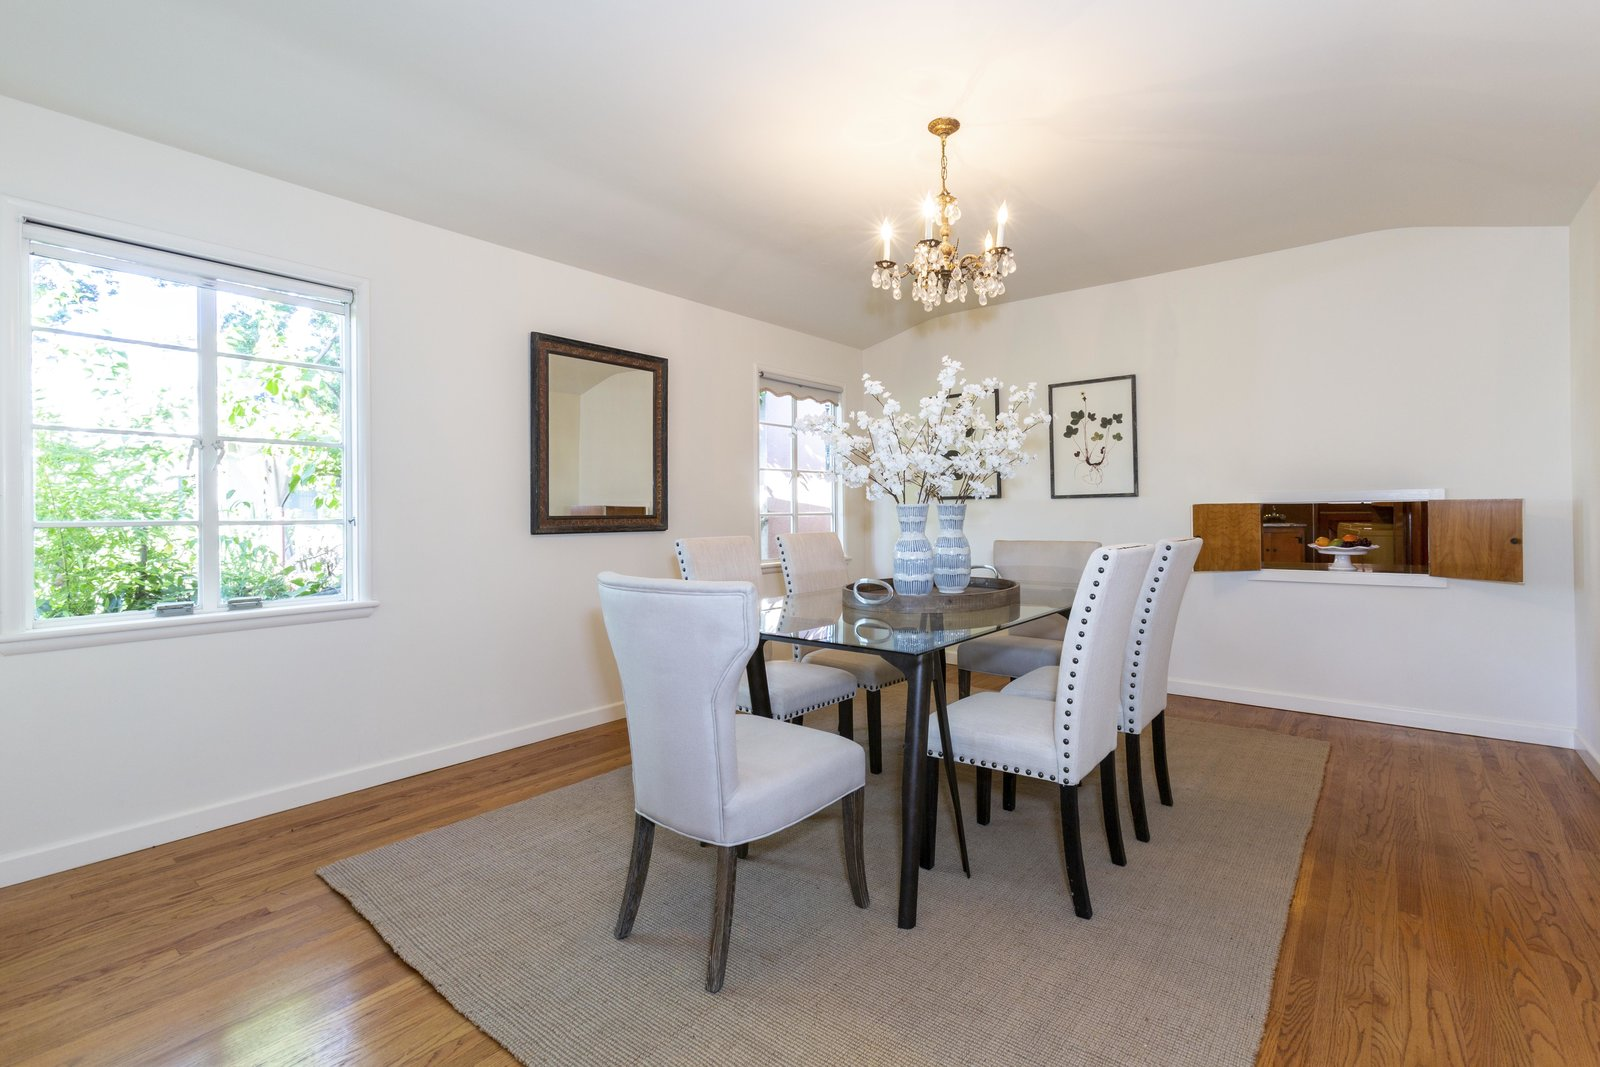 Joseph Gordon-Levitt's Vintage 1940s Ranch House Lists For $3.85M